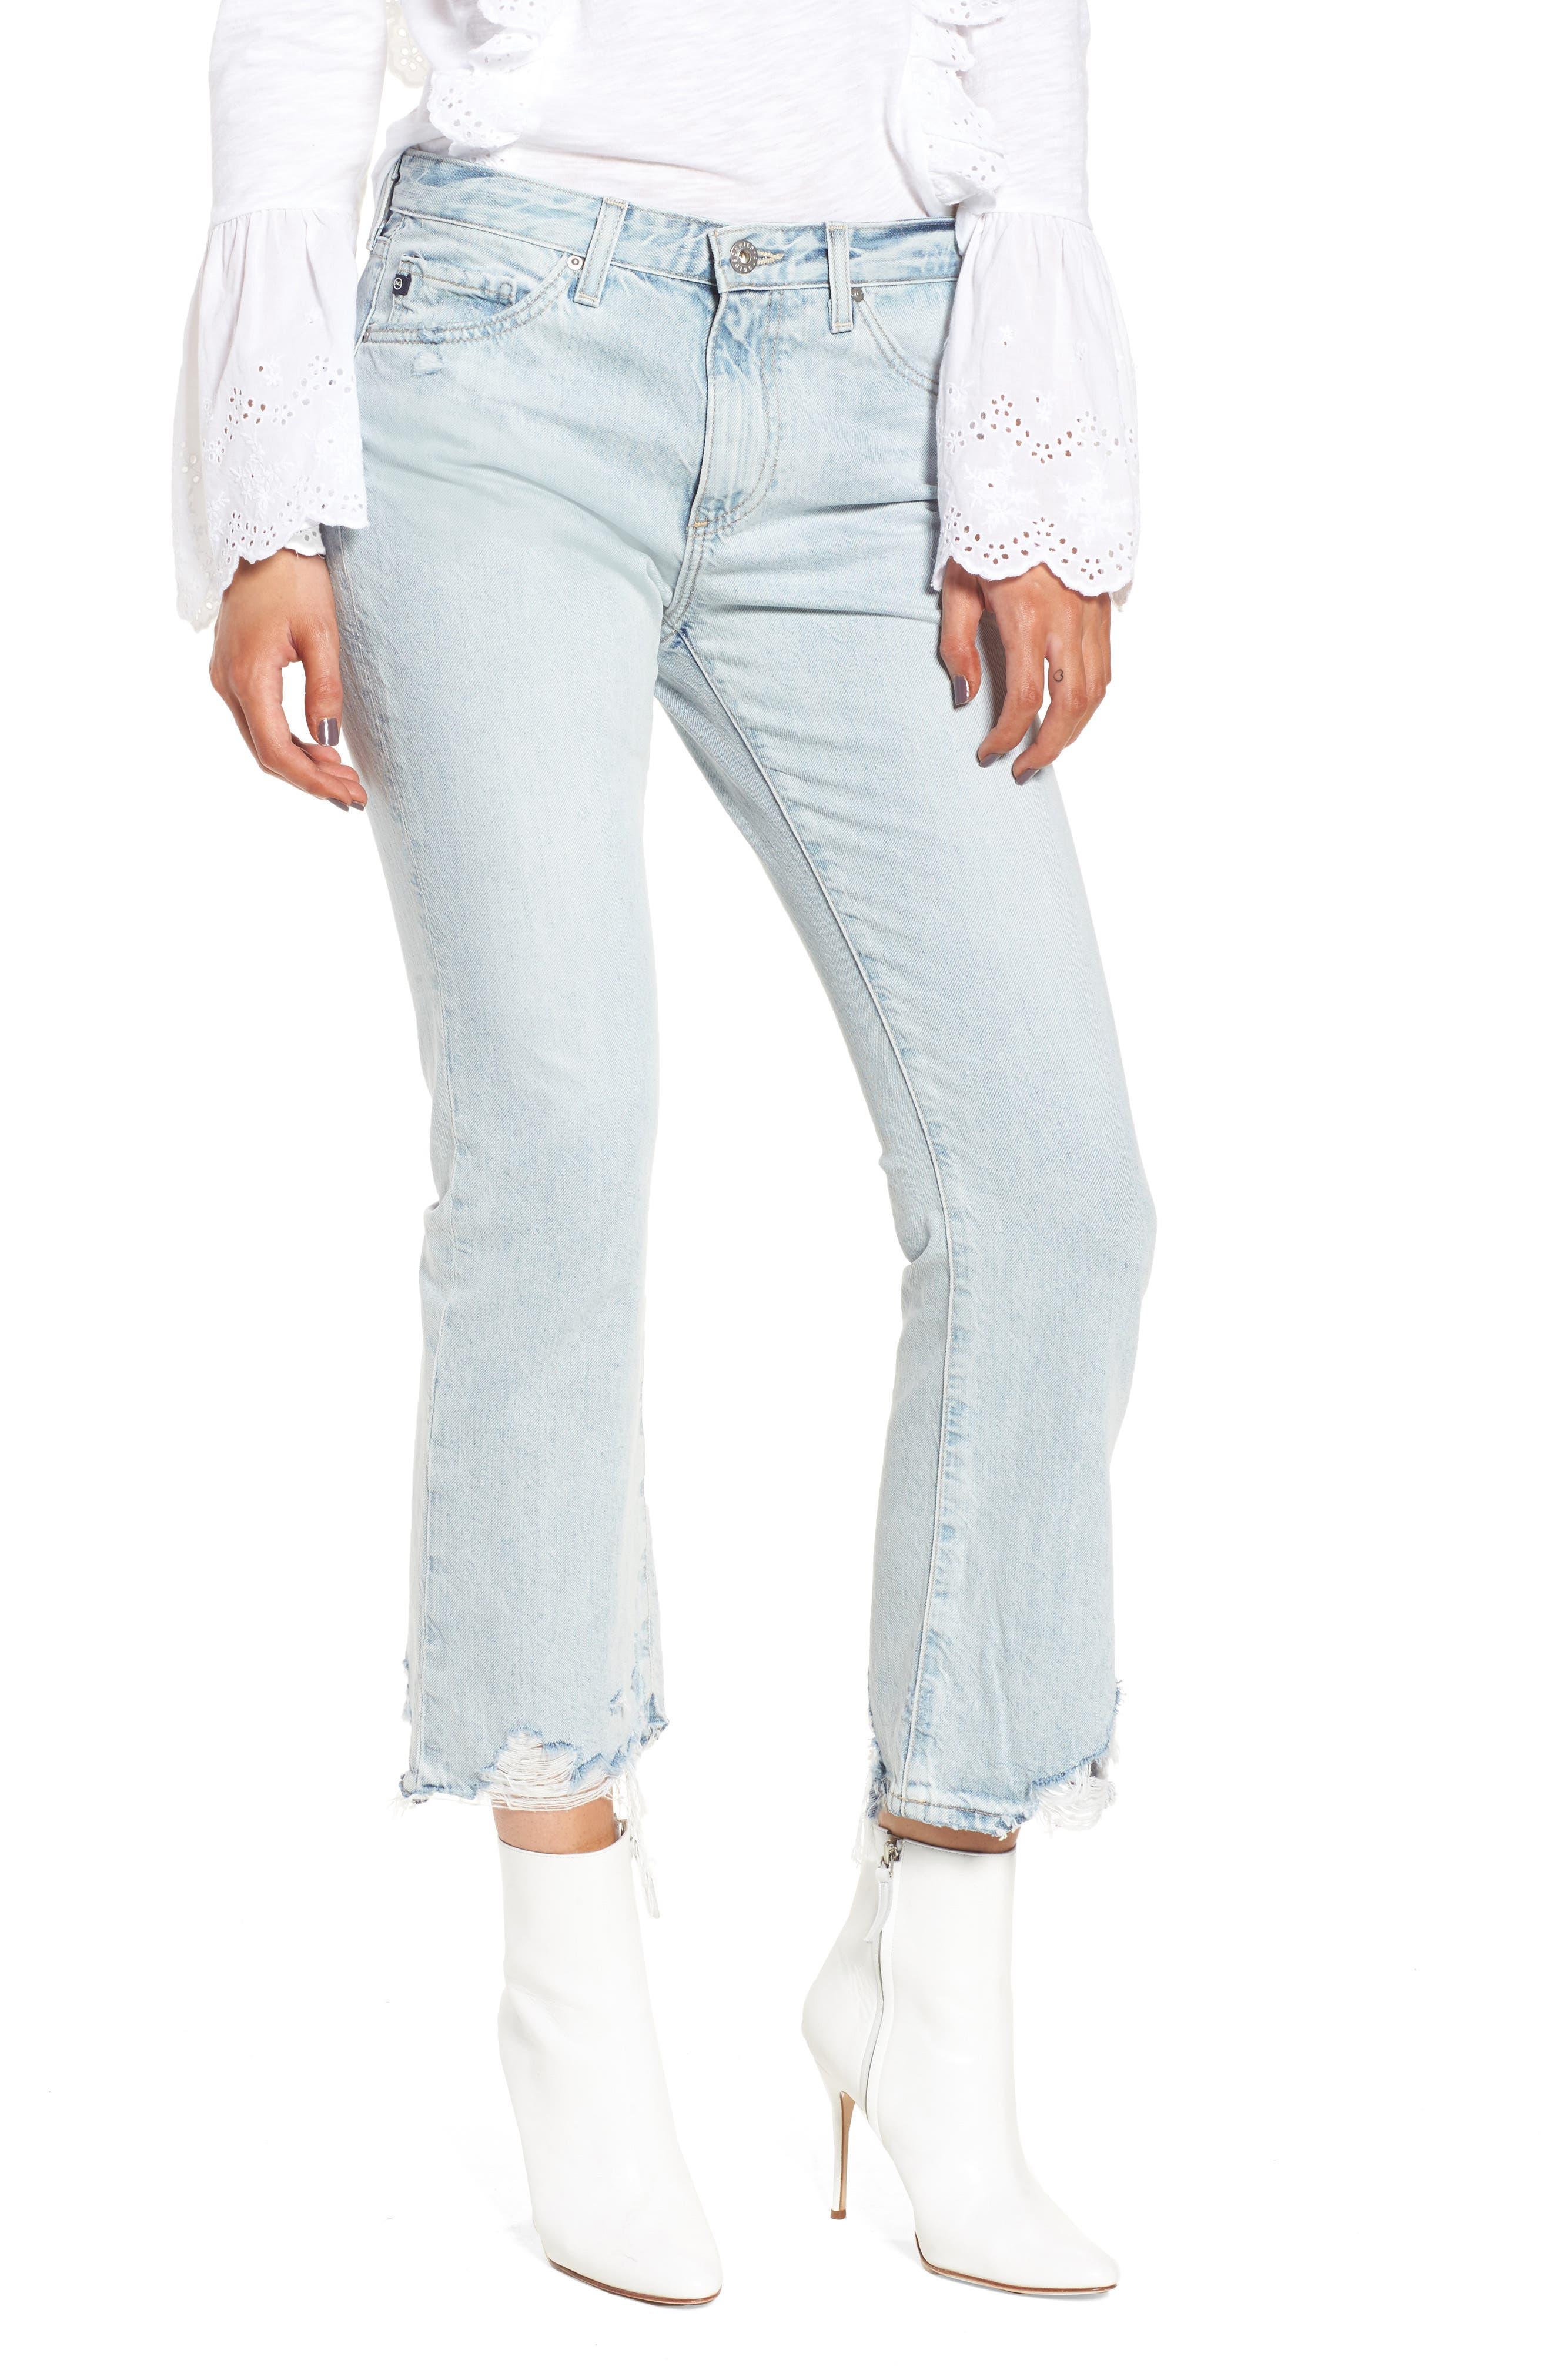 Alternate Image 1 Selected - AG Jeans Jodi Crop Jeans (Bering Wave)